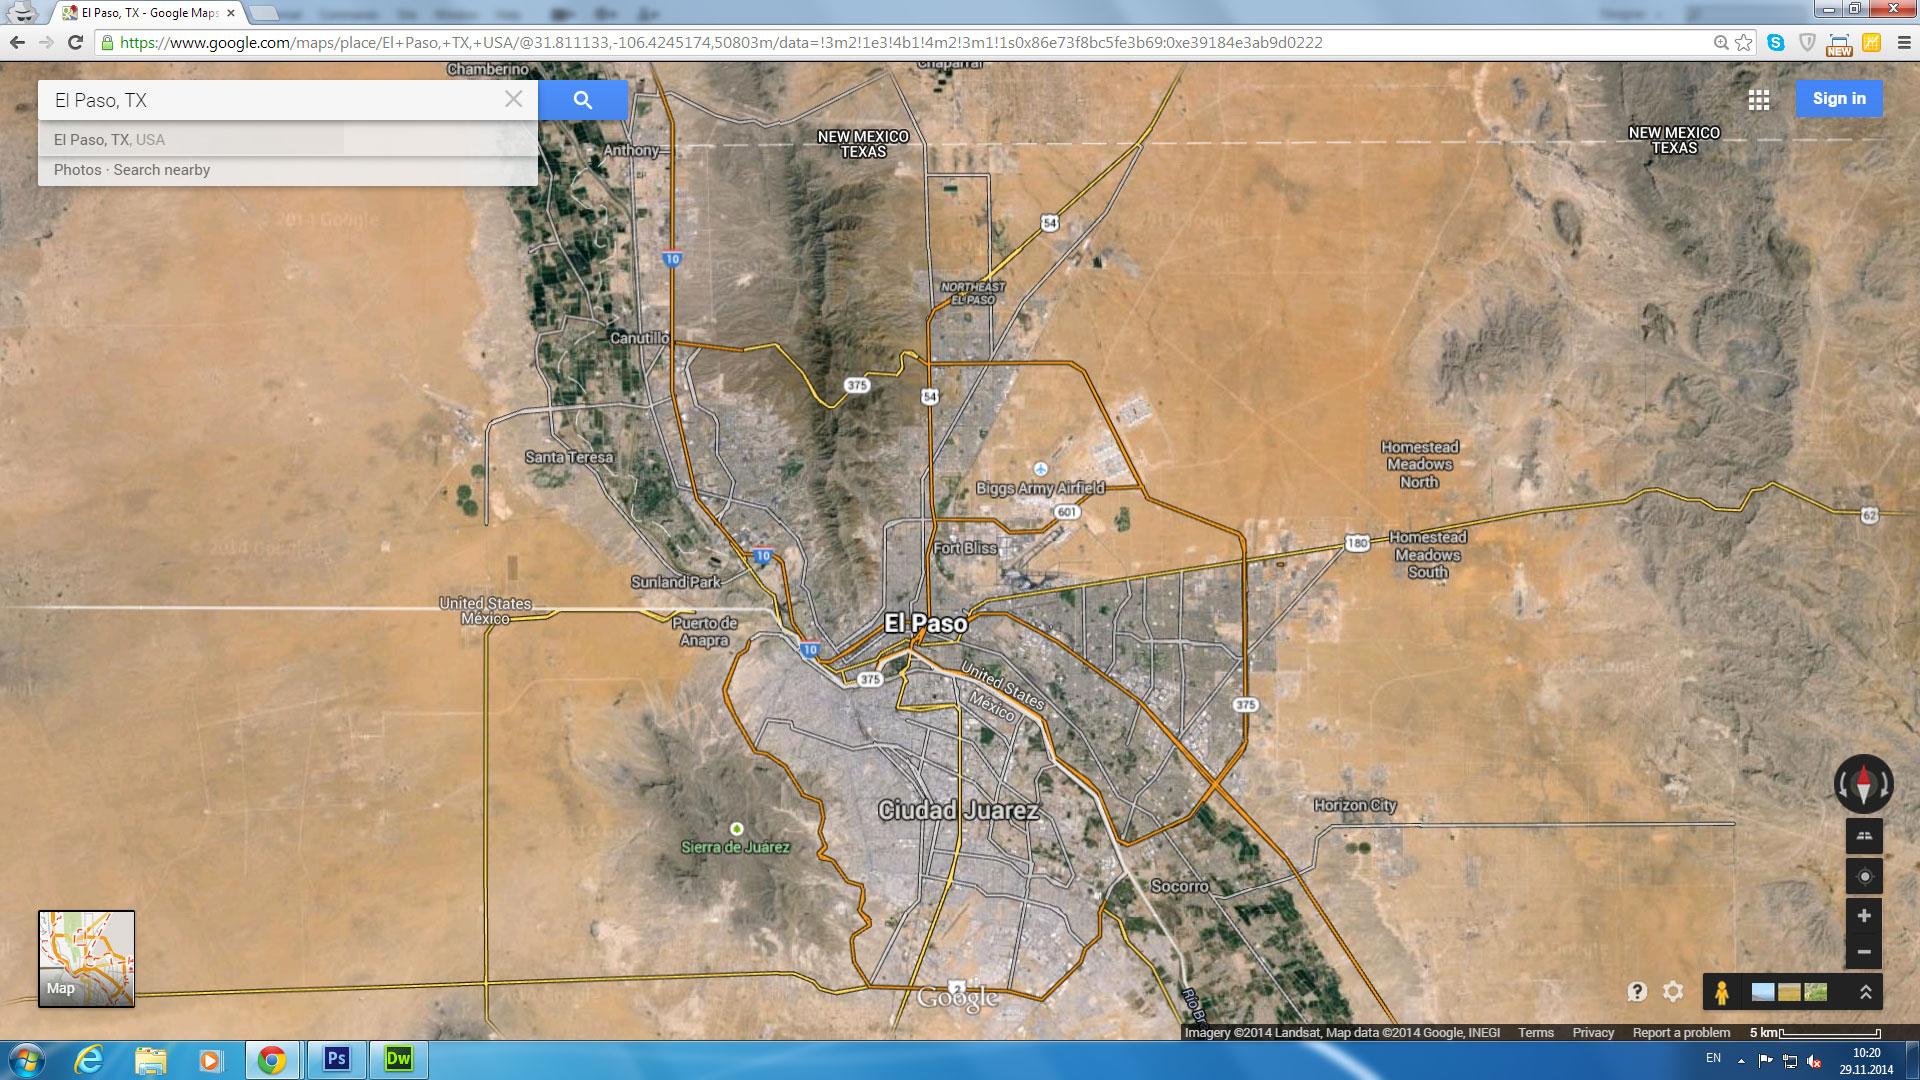 El Paso Maps Satellite Google Maps El Paso Texas | Travel Maps And - Google Maps Satellite Texas